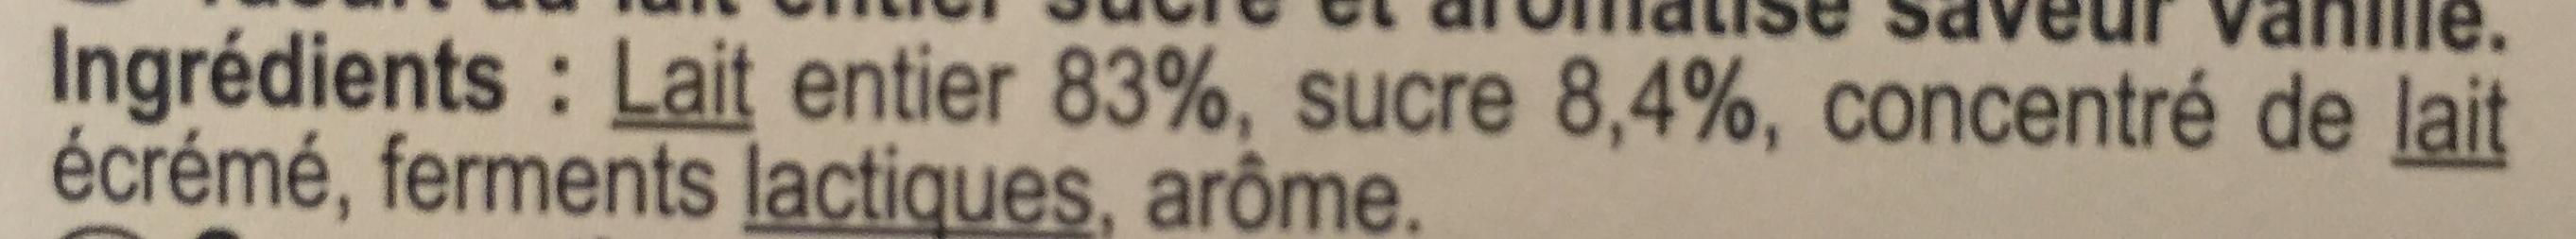 Yaourt saveur vanille - Ingredients